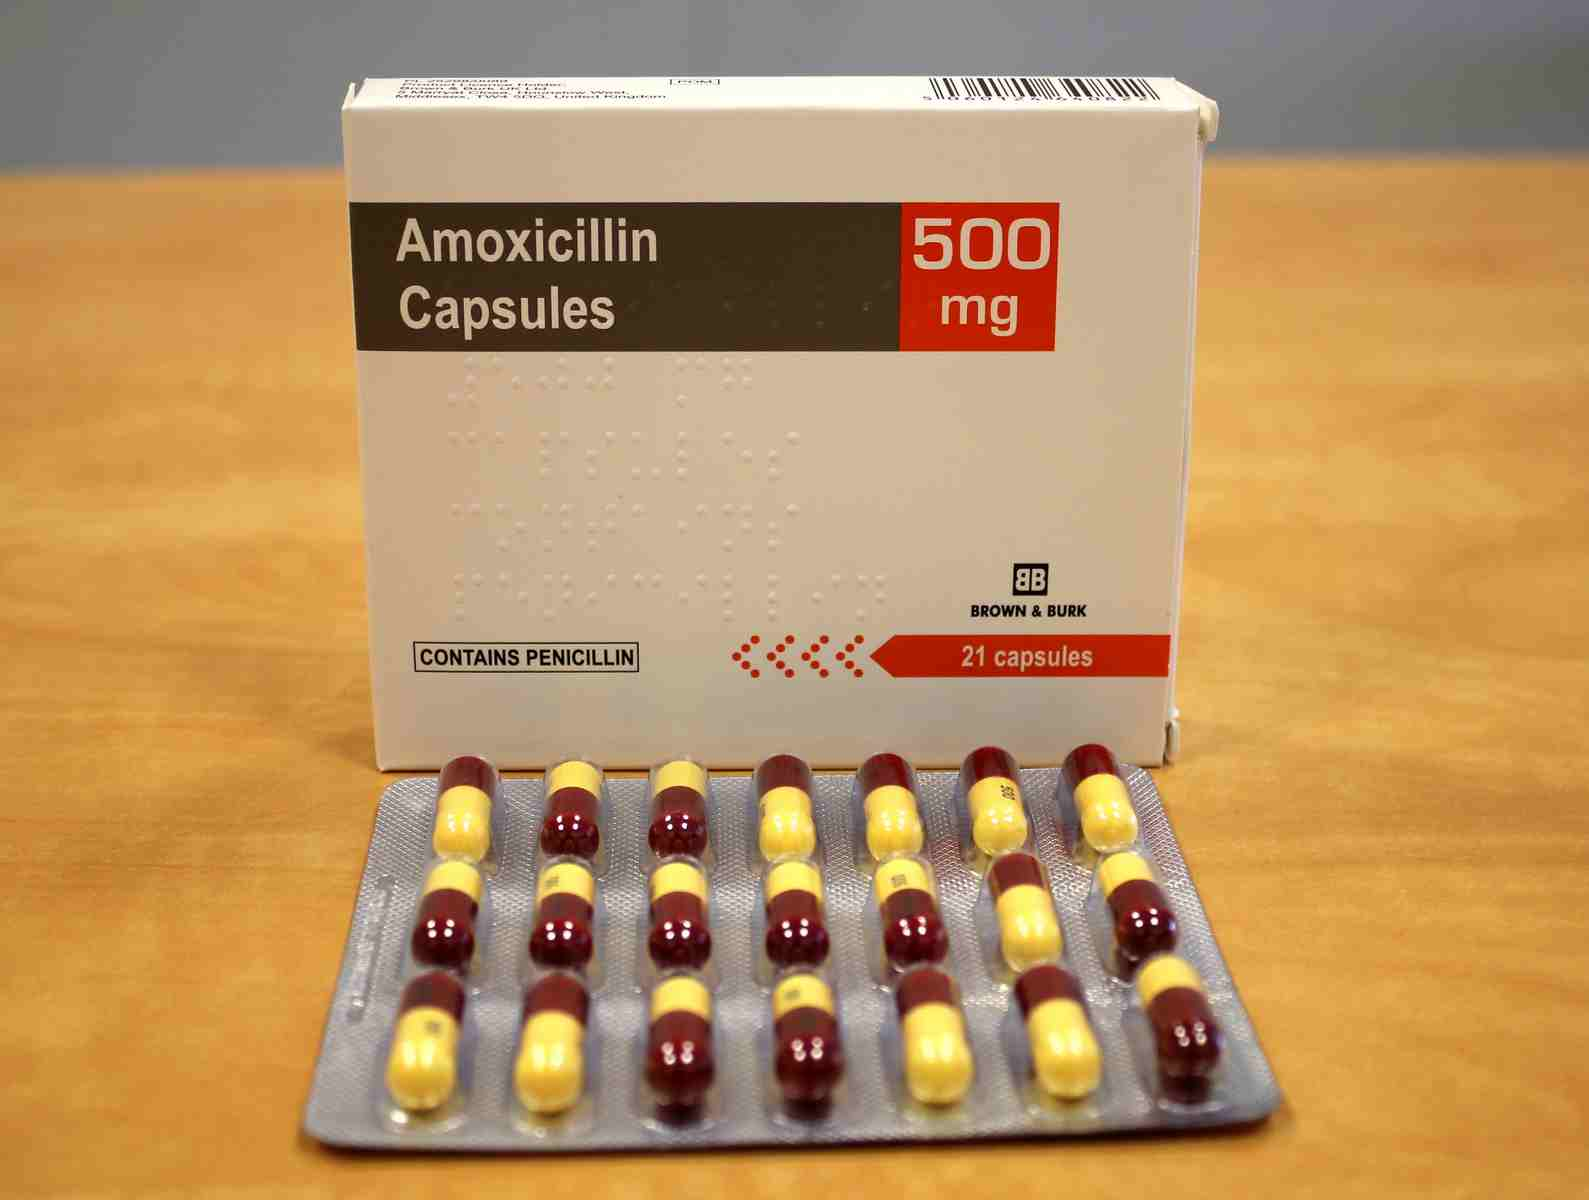 Amoxicillin 500 mg Capsules